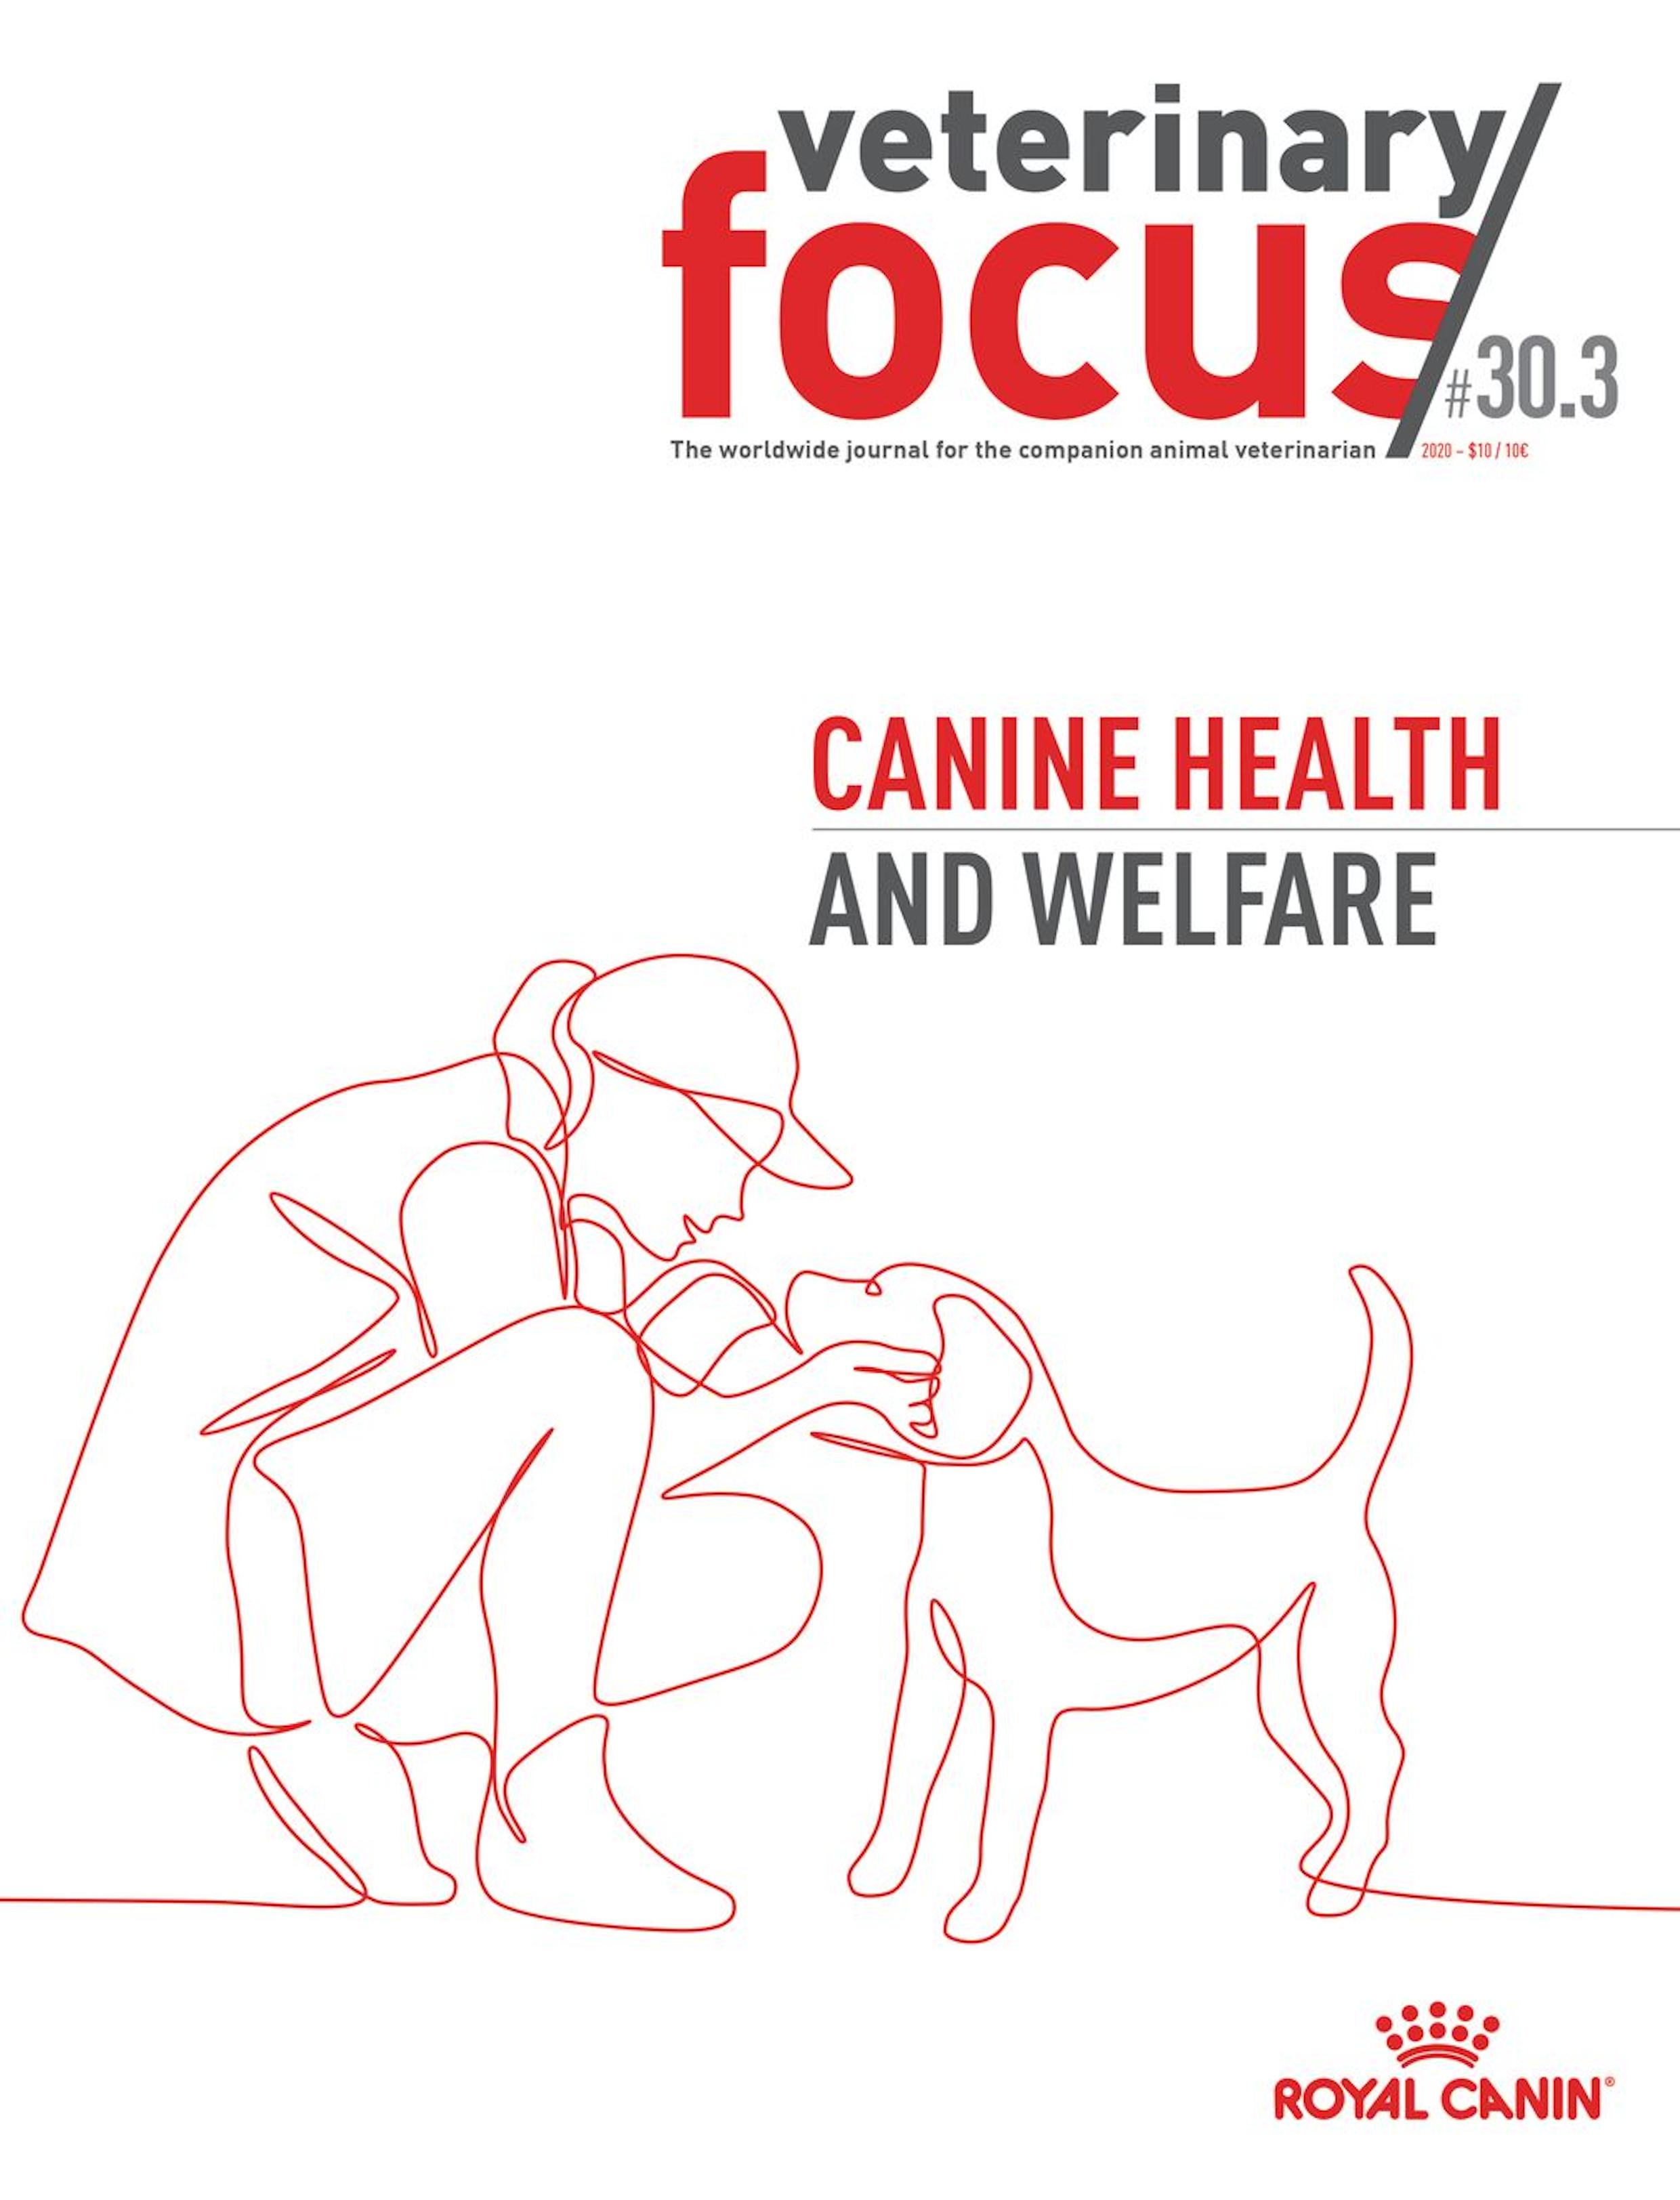 Canine Health and Welfare